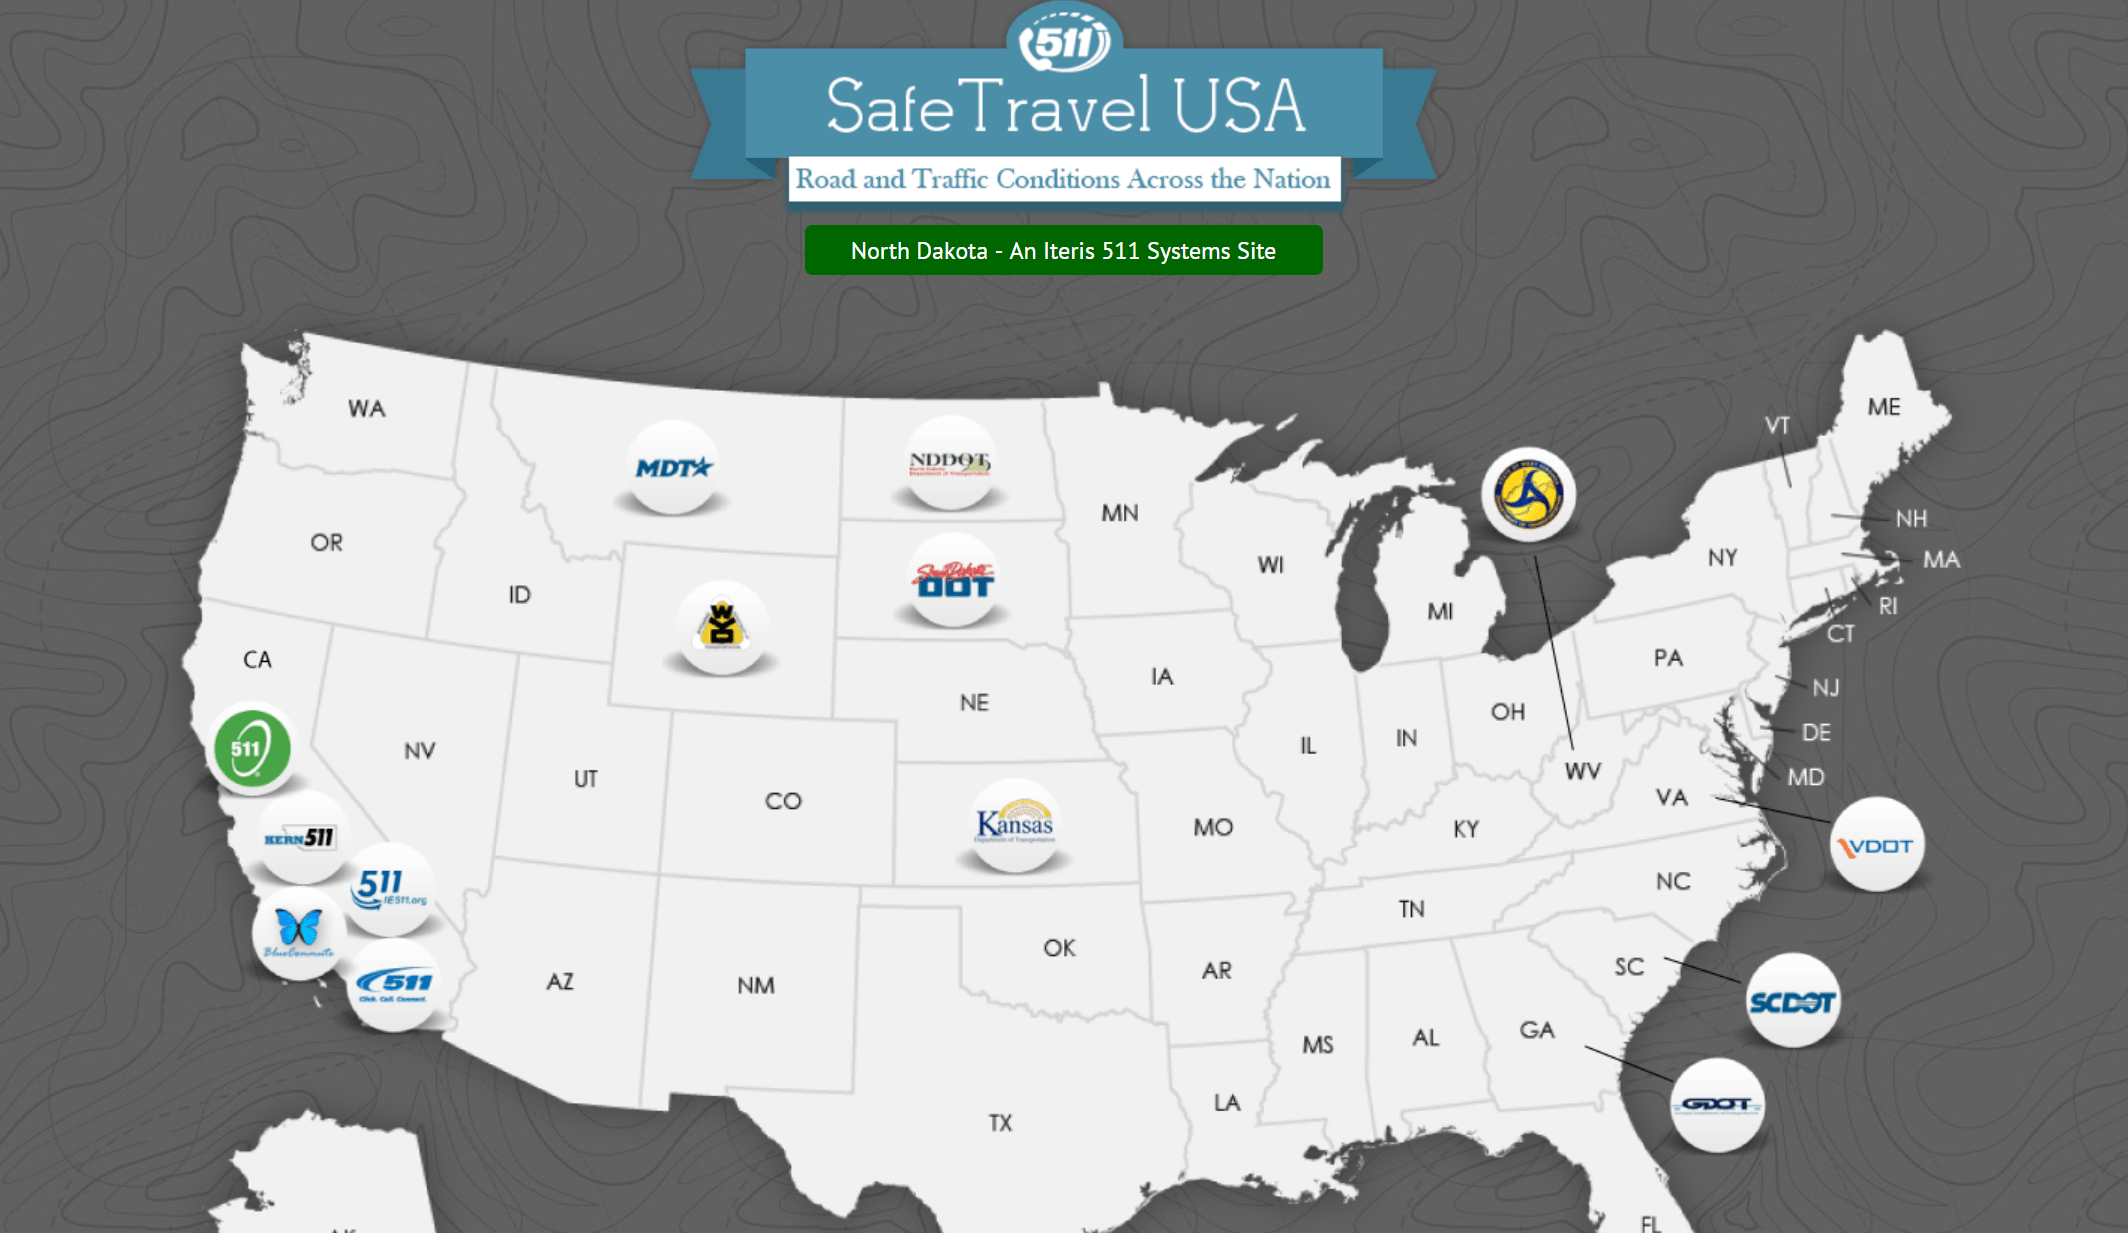 511 Safe Travel USA Map